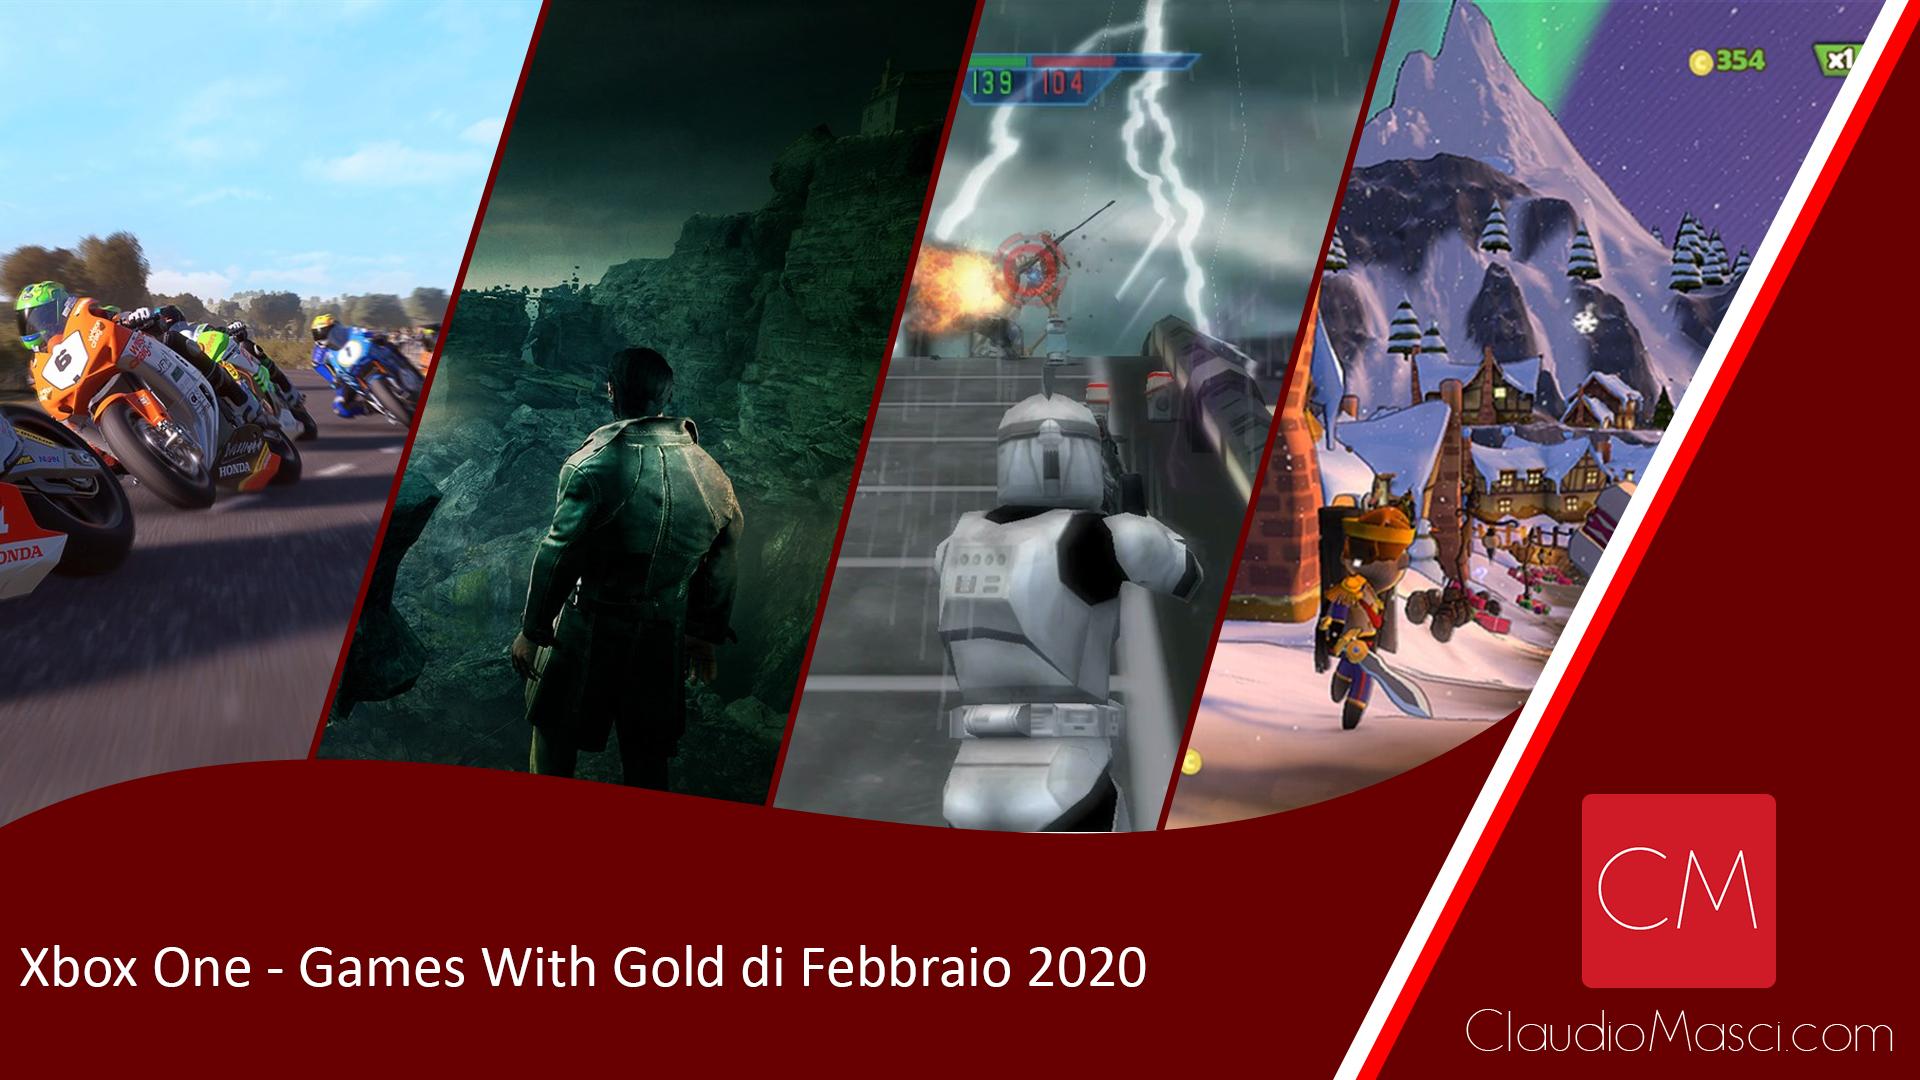 Games With Gold di Febbraio 2020